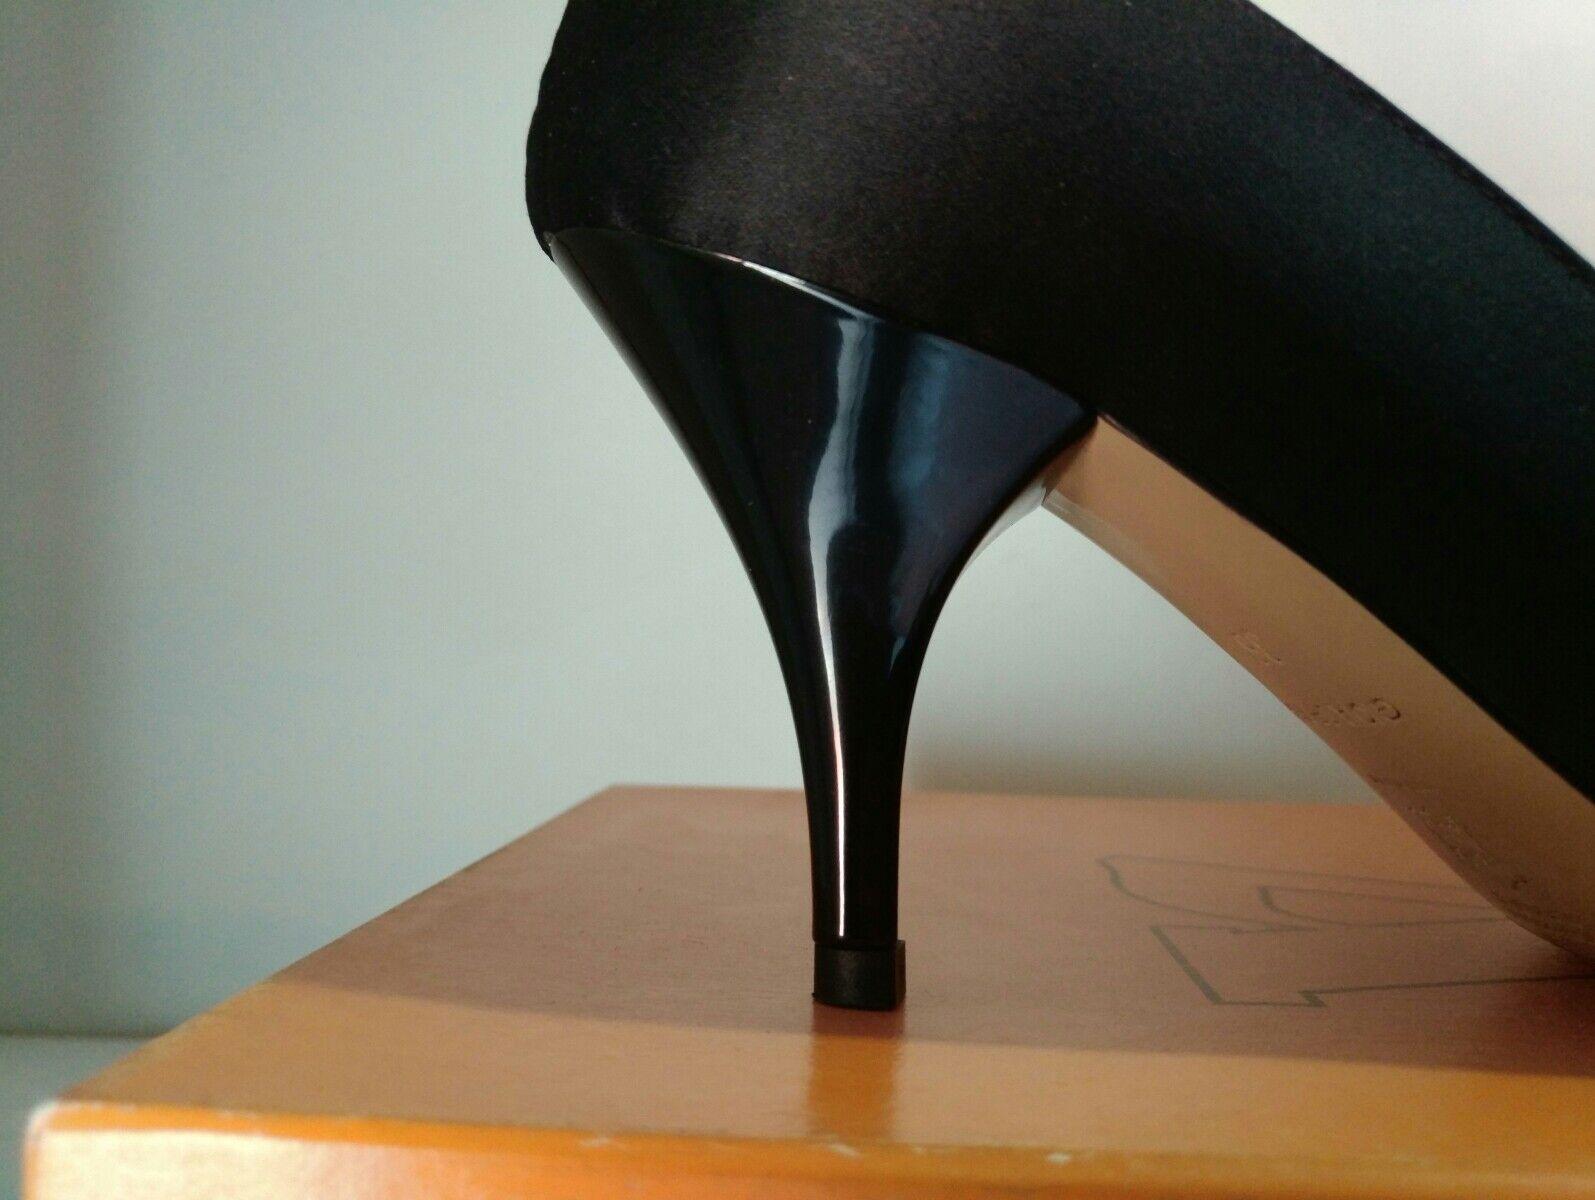 VALLEGrün Decolté Spuntato damen damen damen Elegante in Raso Tessuto schwarz N° 36 Nuovo f28fd9